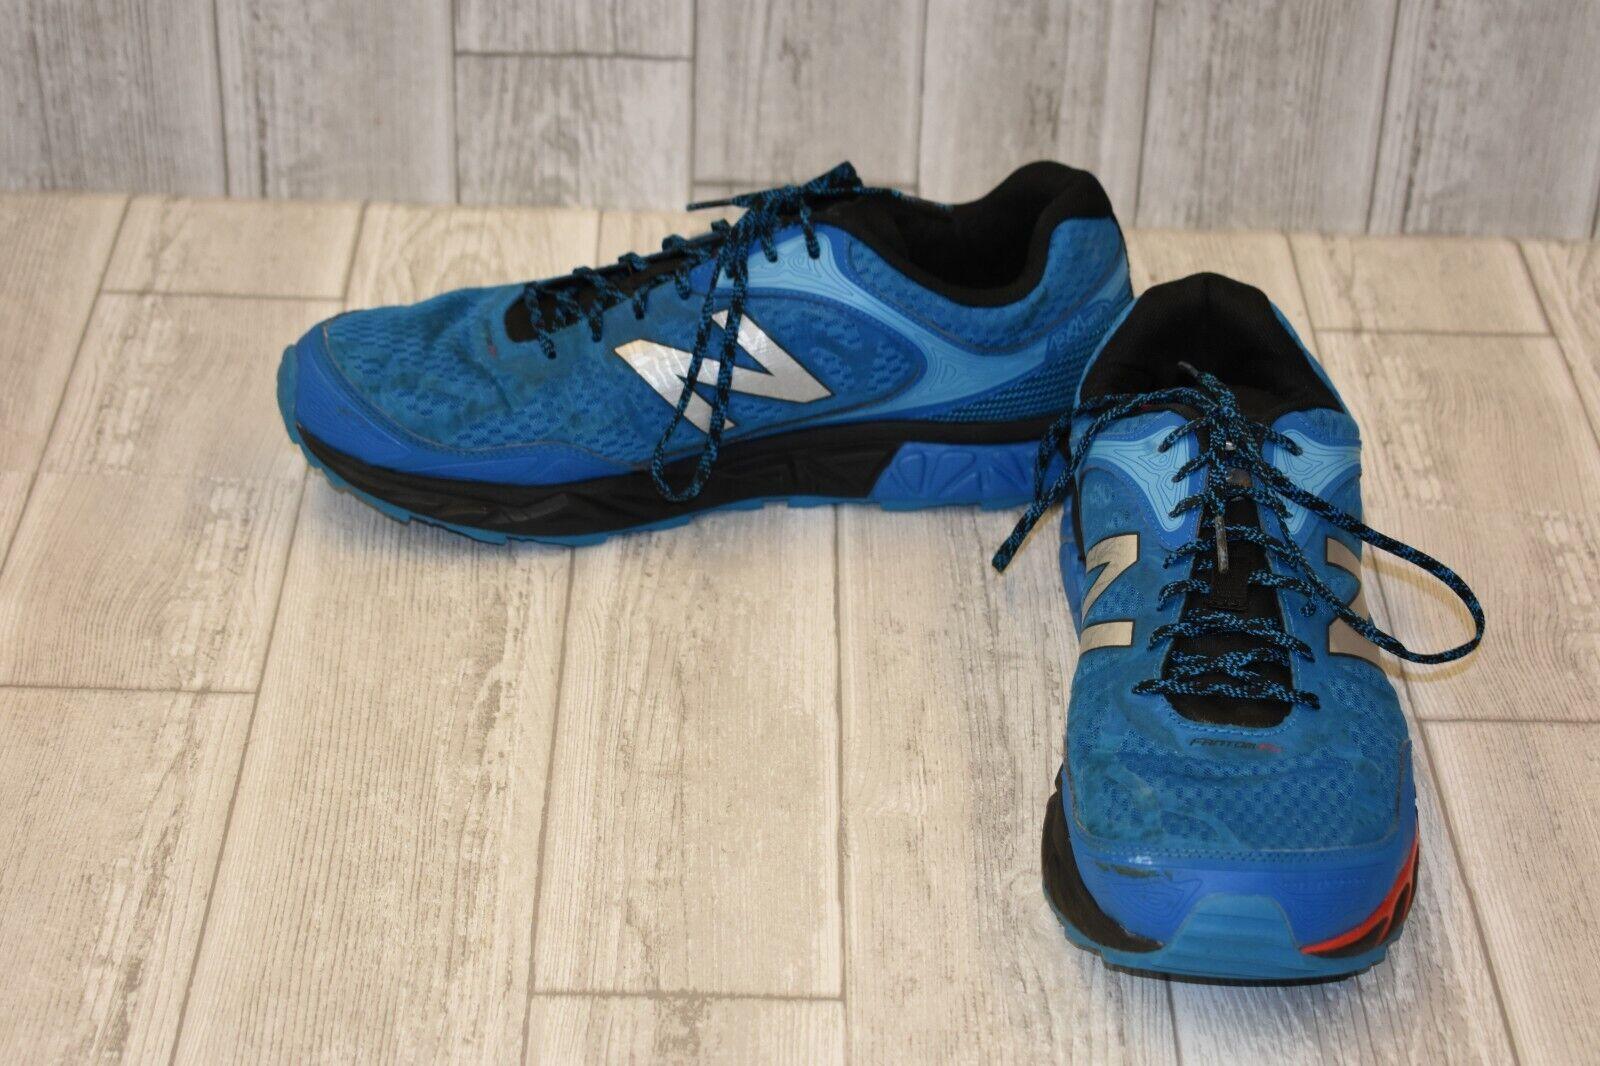 New Para hombre Leadvillev 3 Trail Balance Zapato-Azul rojo-tamaño 15